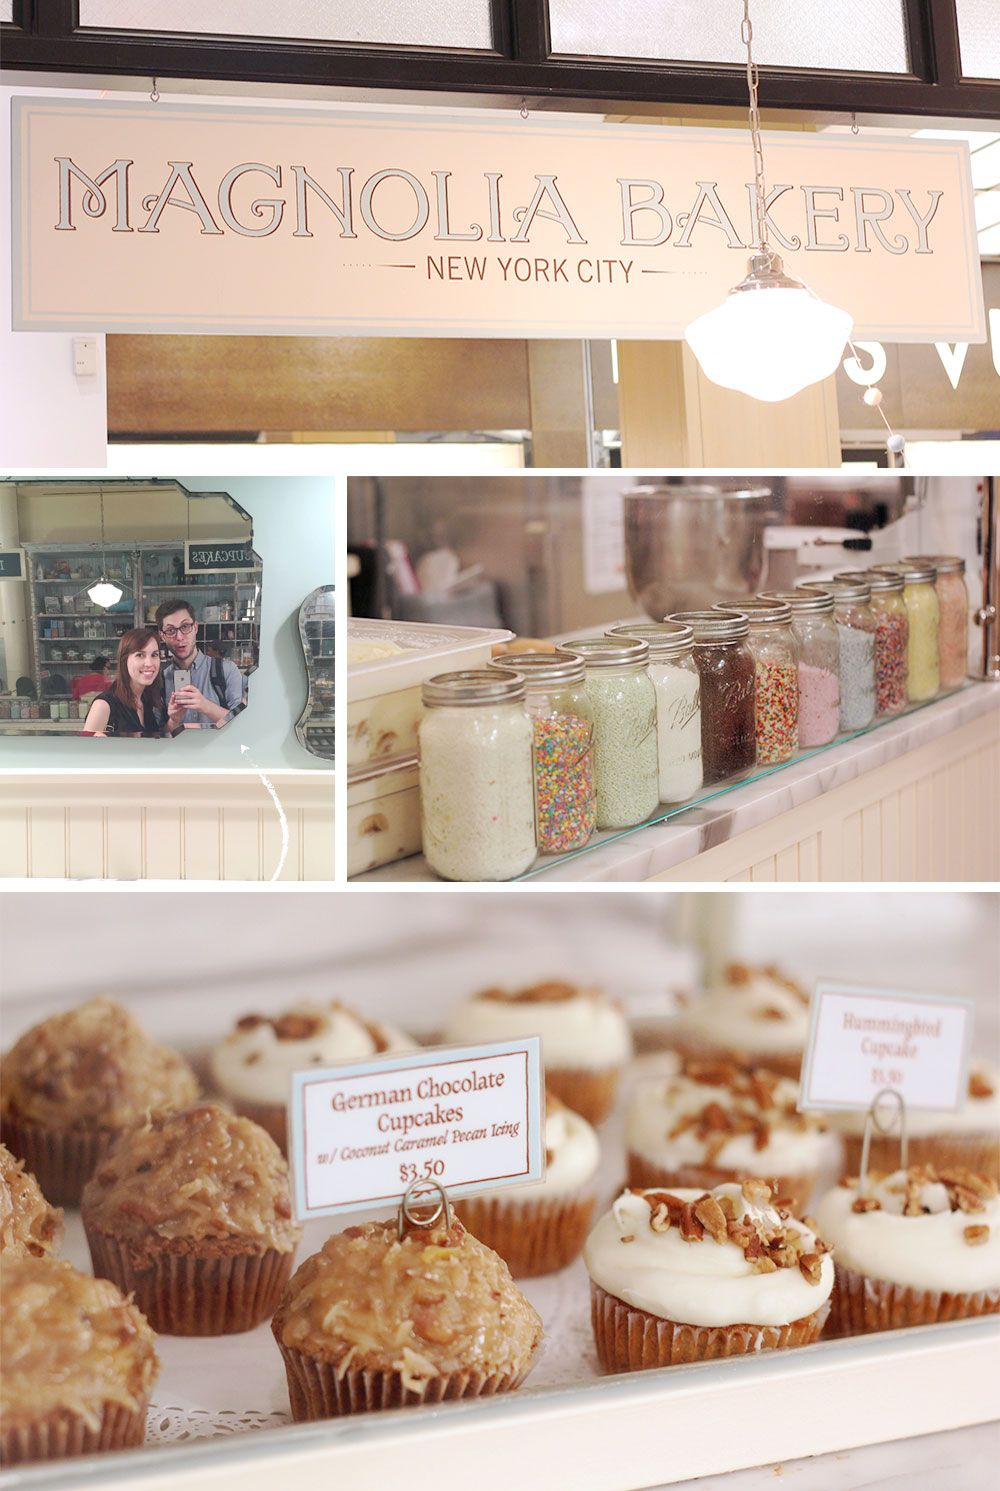 Travel New York Foodspots Saving Bucks Part Iii In 2020 Vegan Bakery Bakery New York Magnolias Bakery